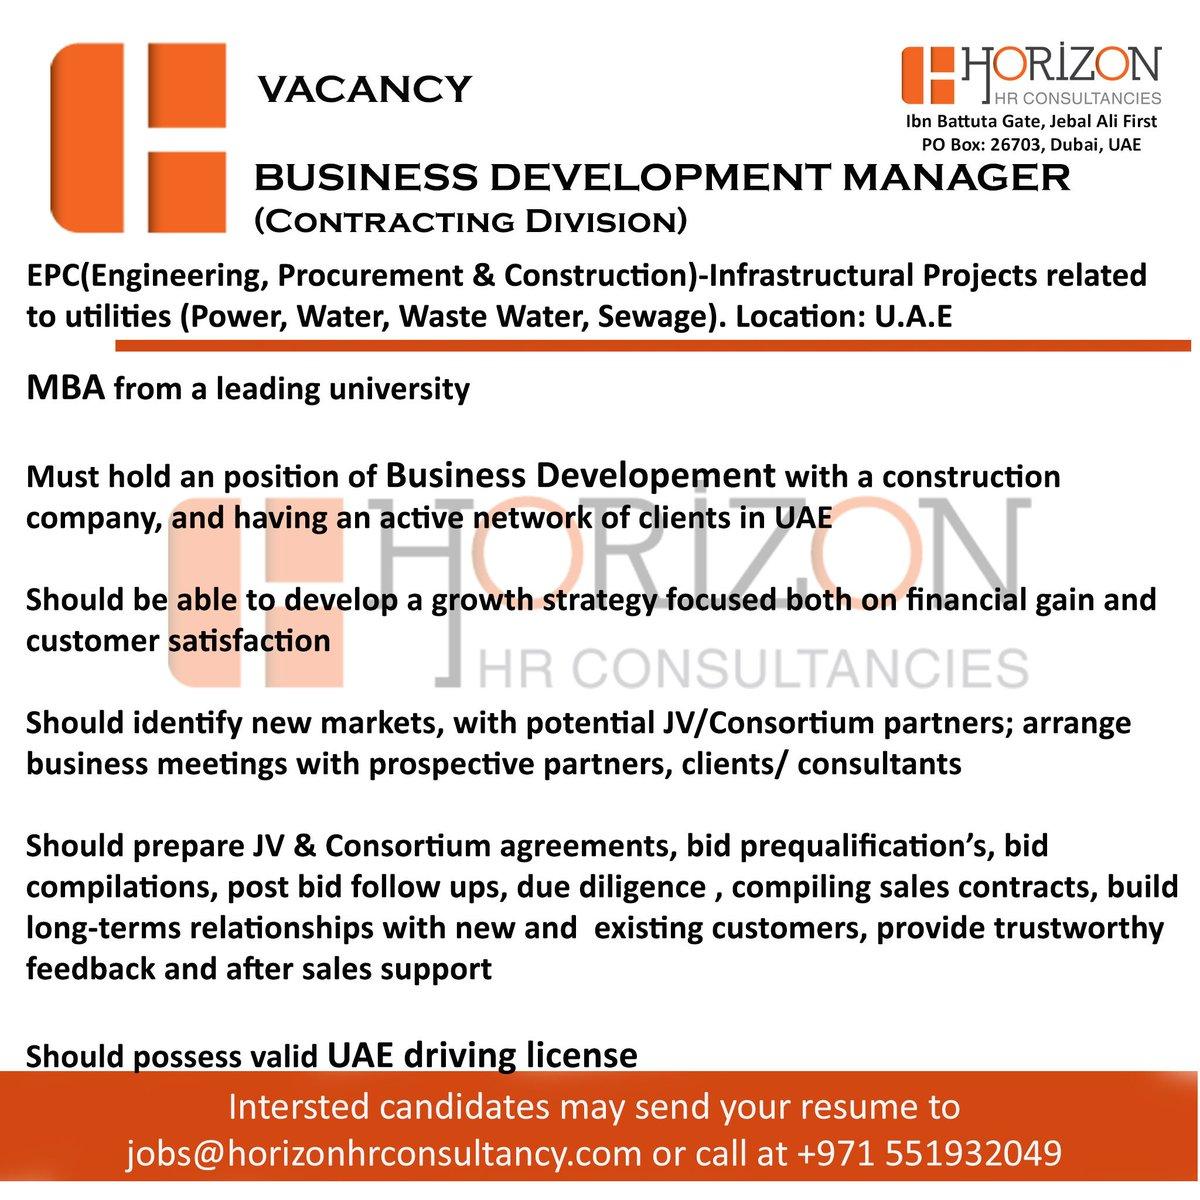 Horizon Capital HR Consultancies on Twitter: